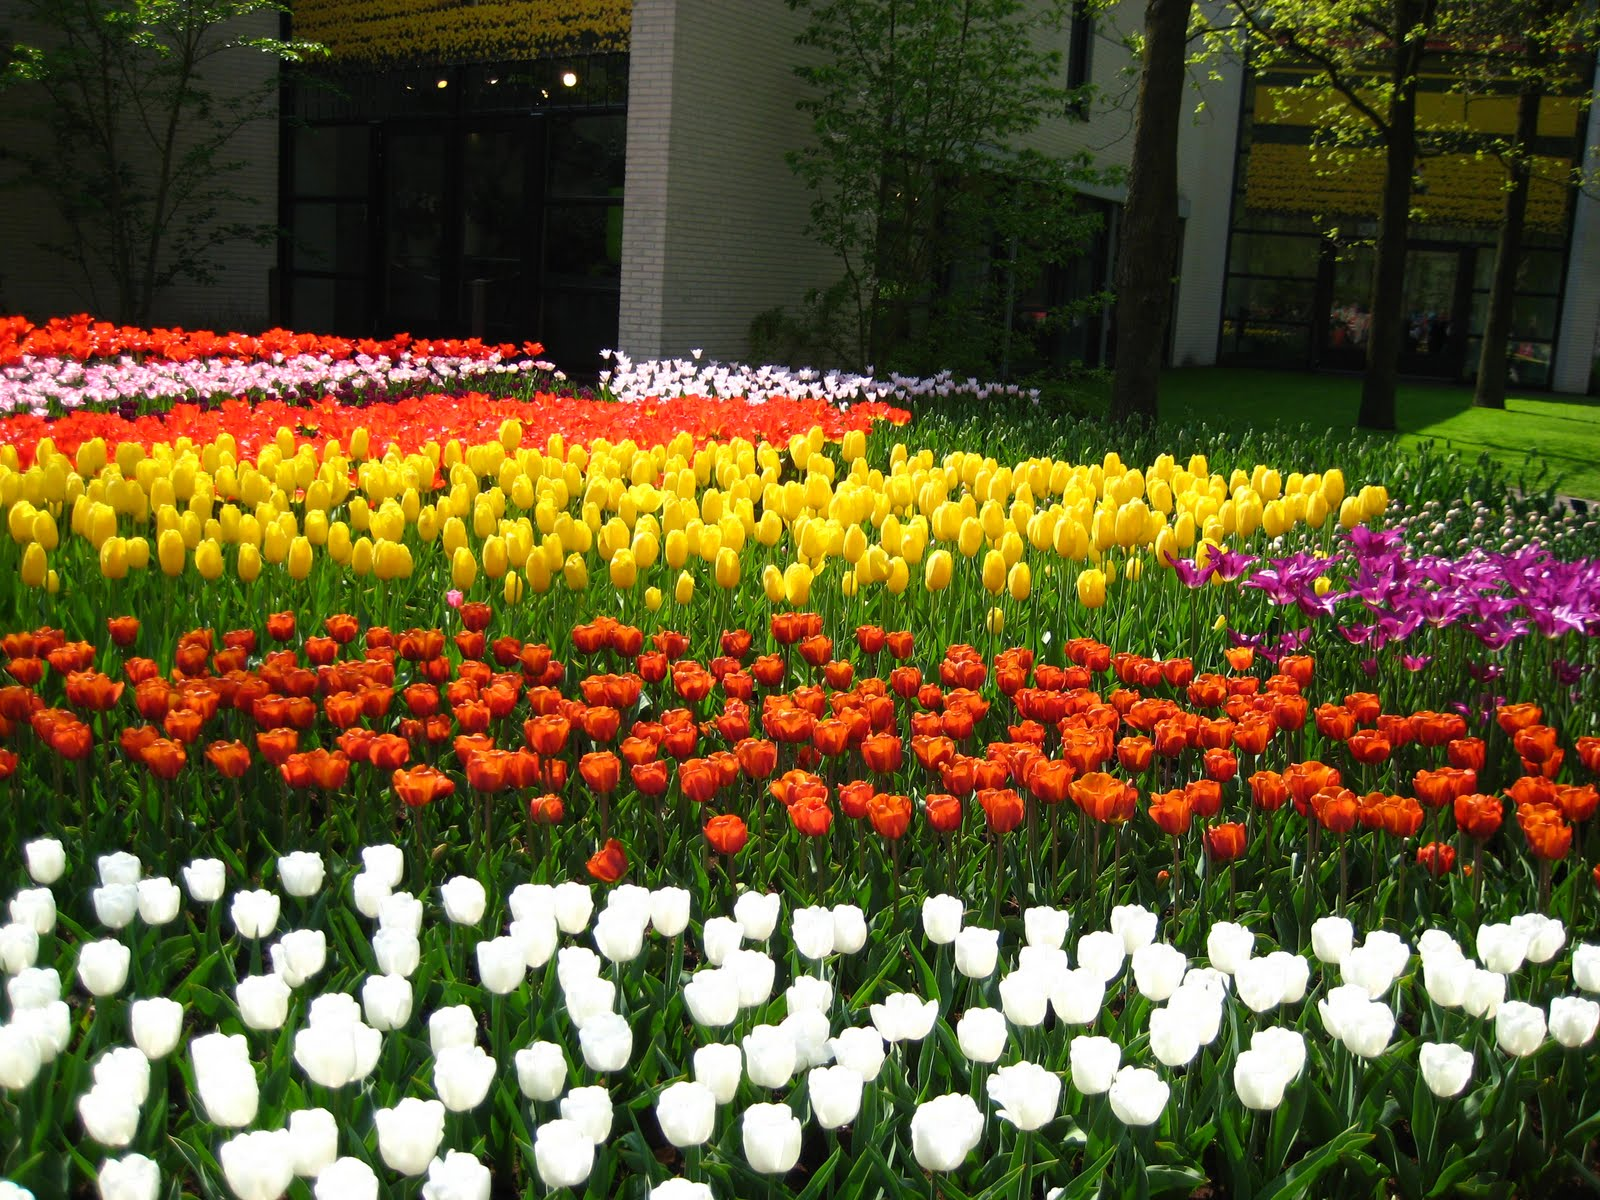 tulips garden wallpaper - photo #32